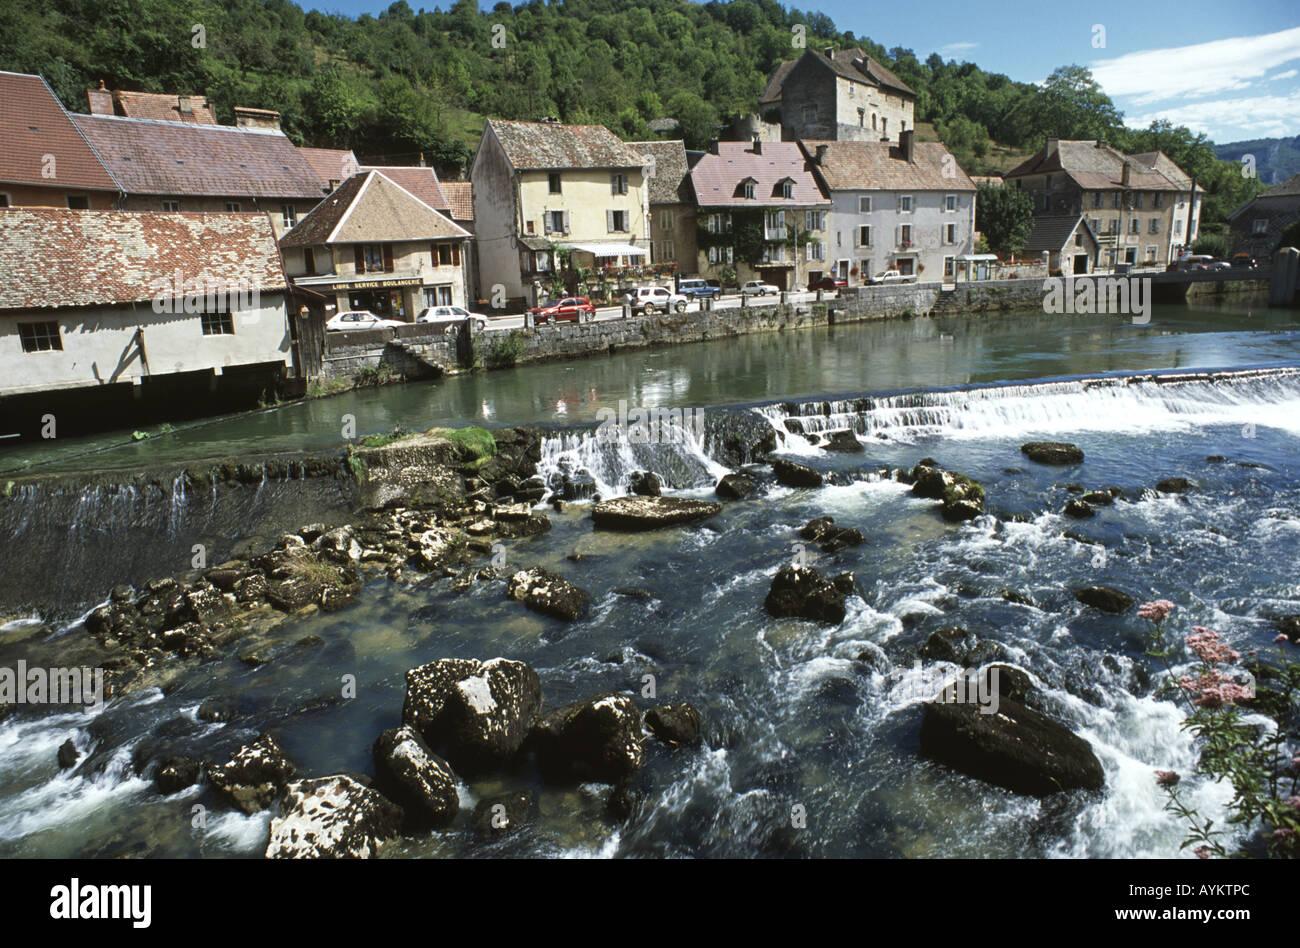 Pretty riverside village of Lods, Doubs France. - Stock Image